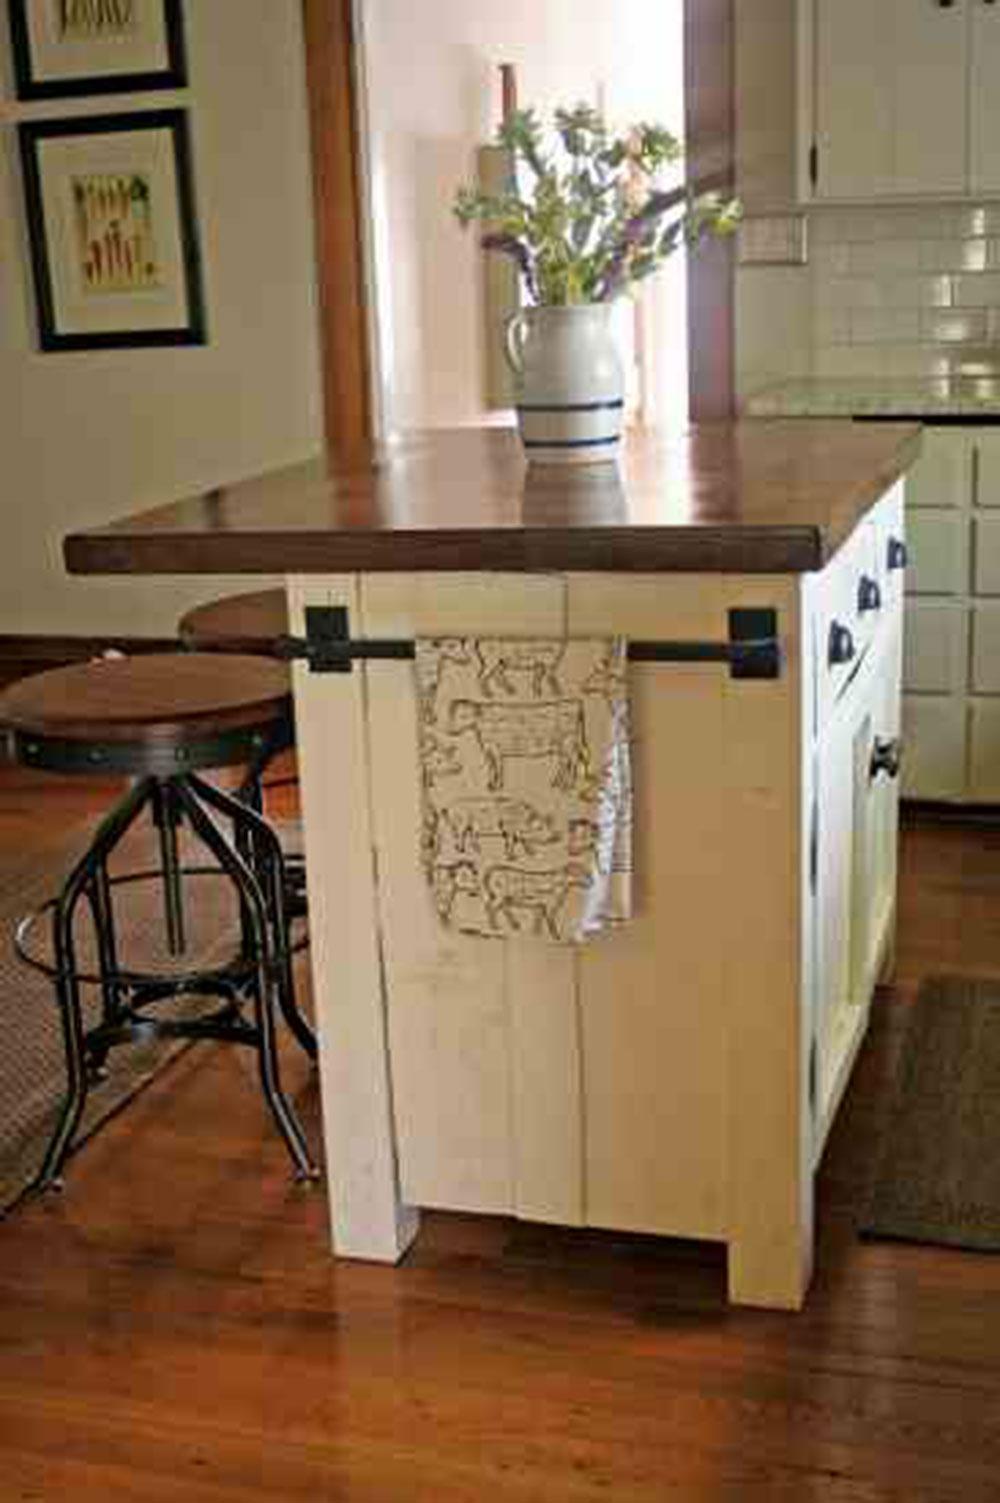 Ikea-Farmhouse-Kitchen-Island How to Build a Kitchen Island (17 DIY Kitchen Island Plans)